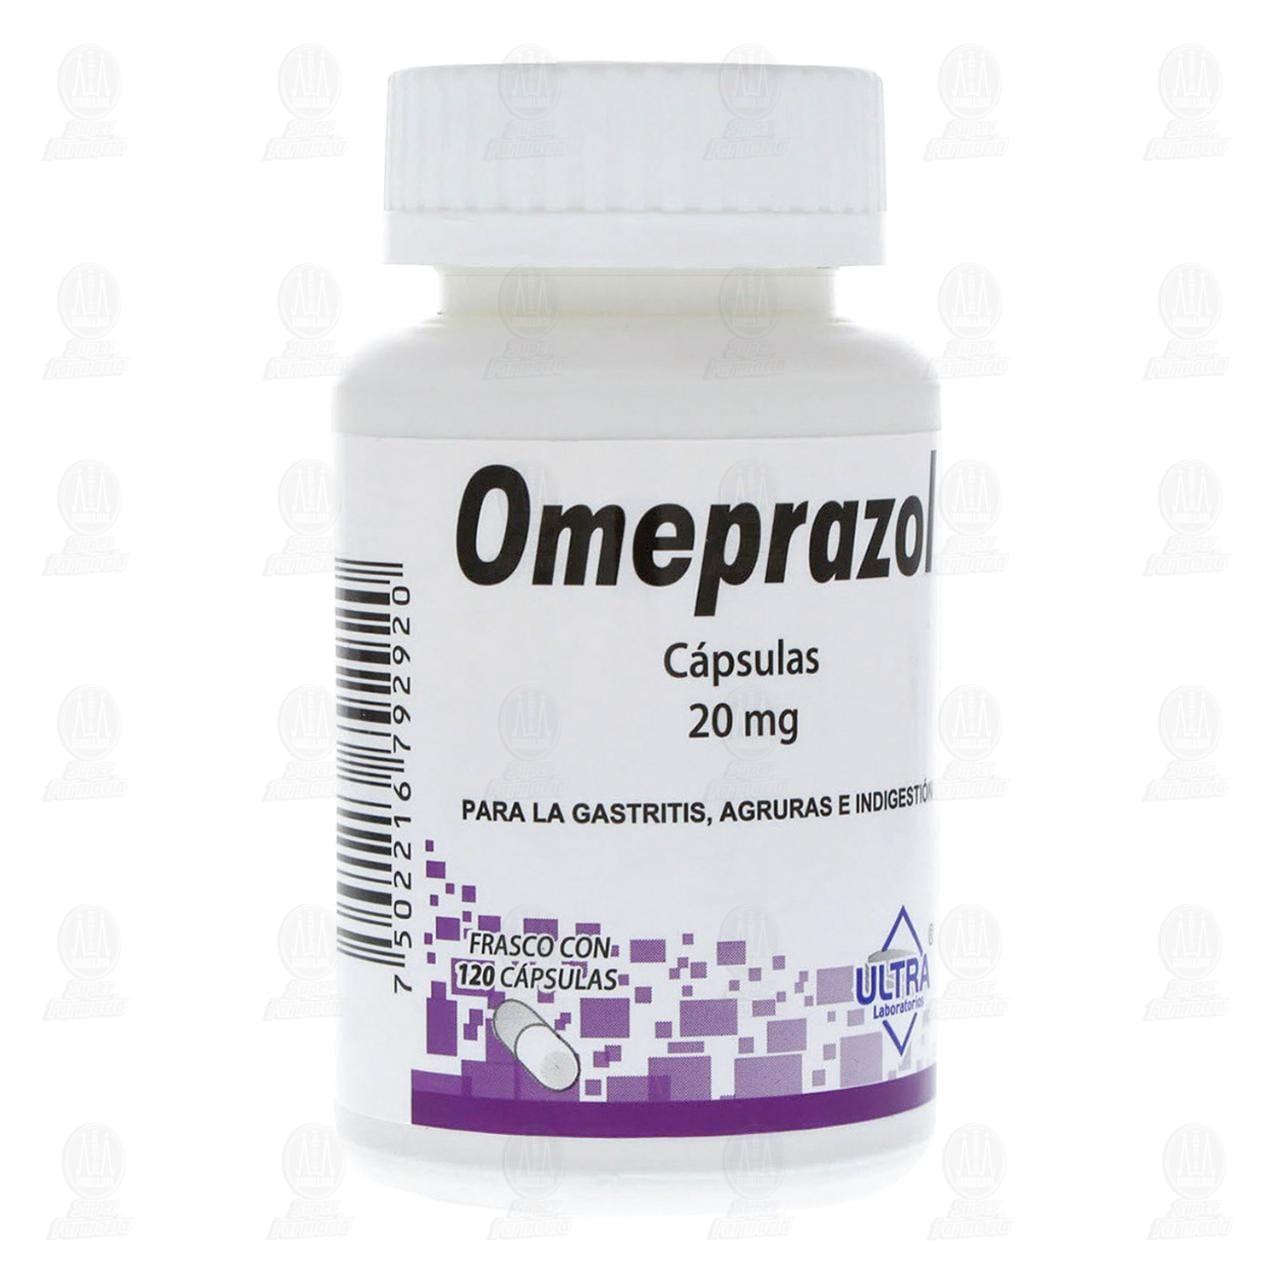 Comprar Omeprazol 20mg 120 Cápsulas en Farmacias Guadalajara